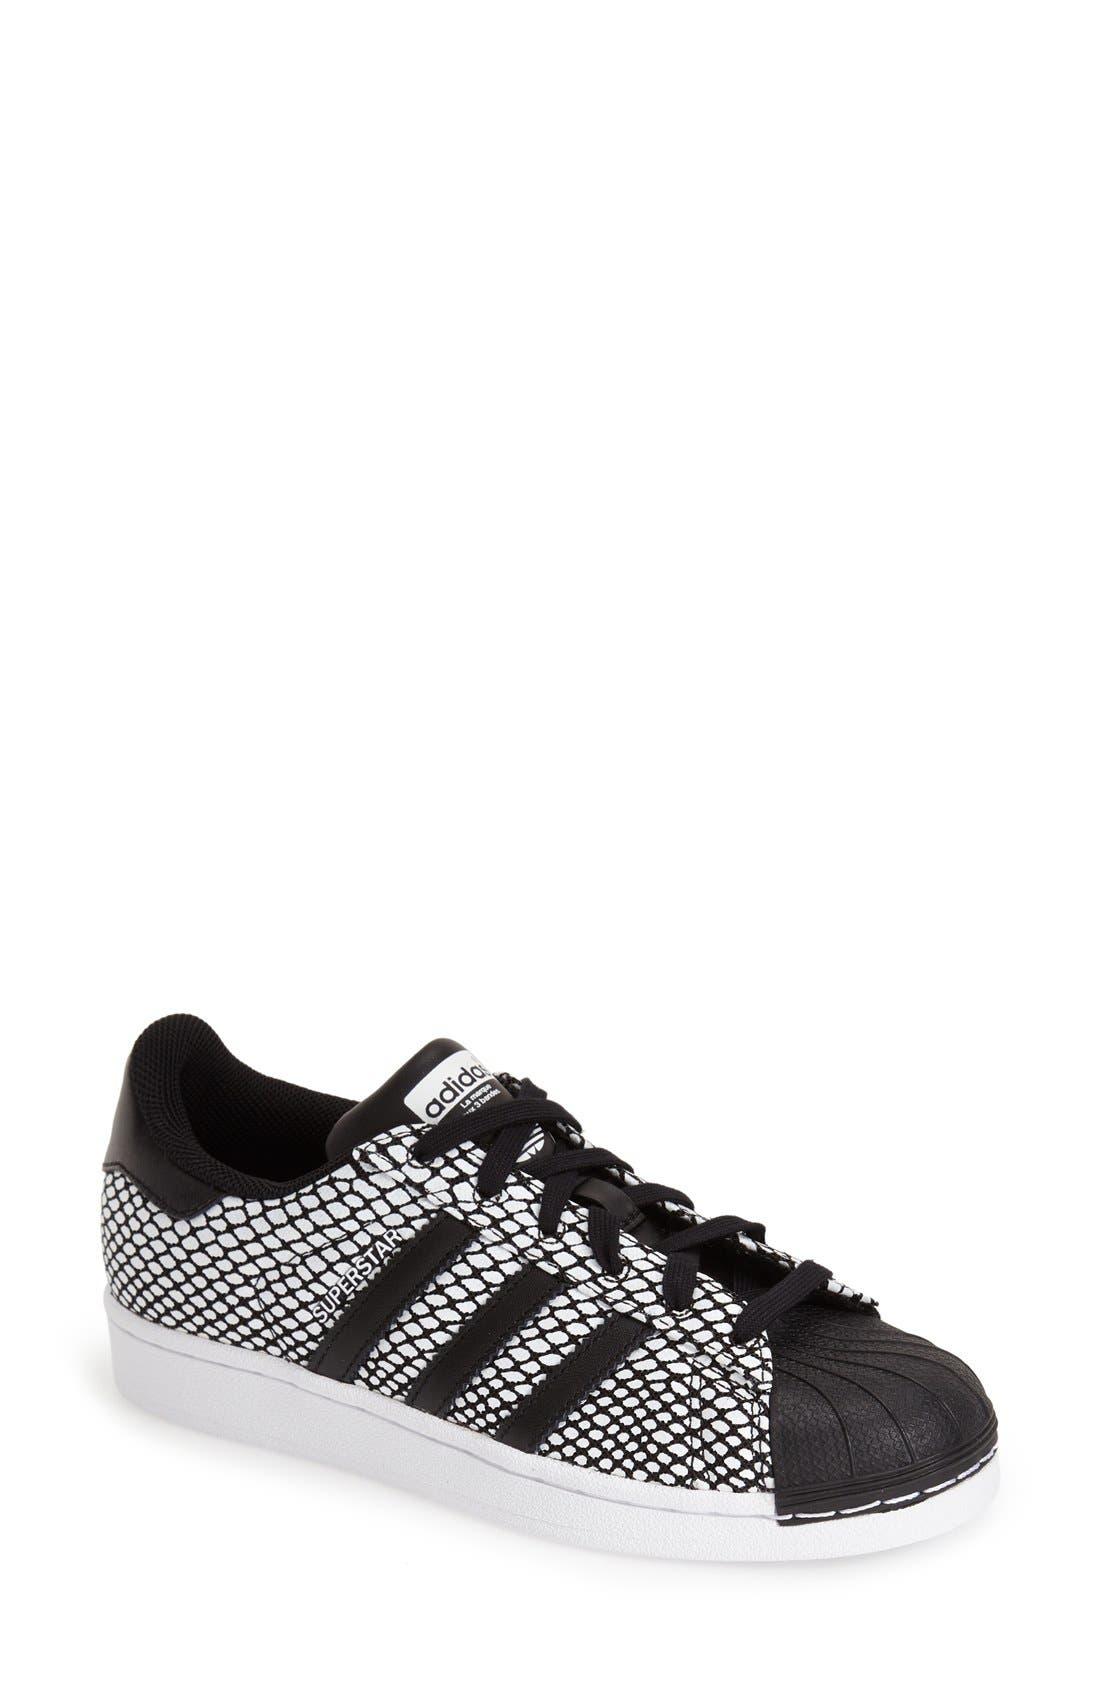 Main Image - adidas 'Superstar' Snake Embossed Sneaker (Women)